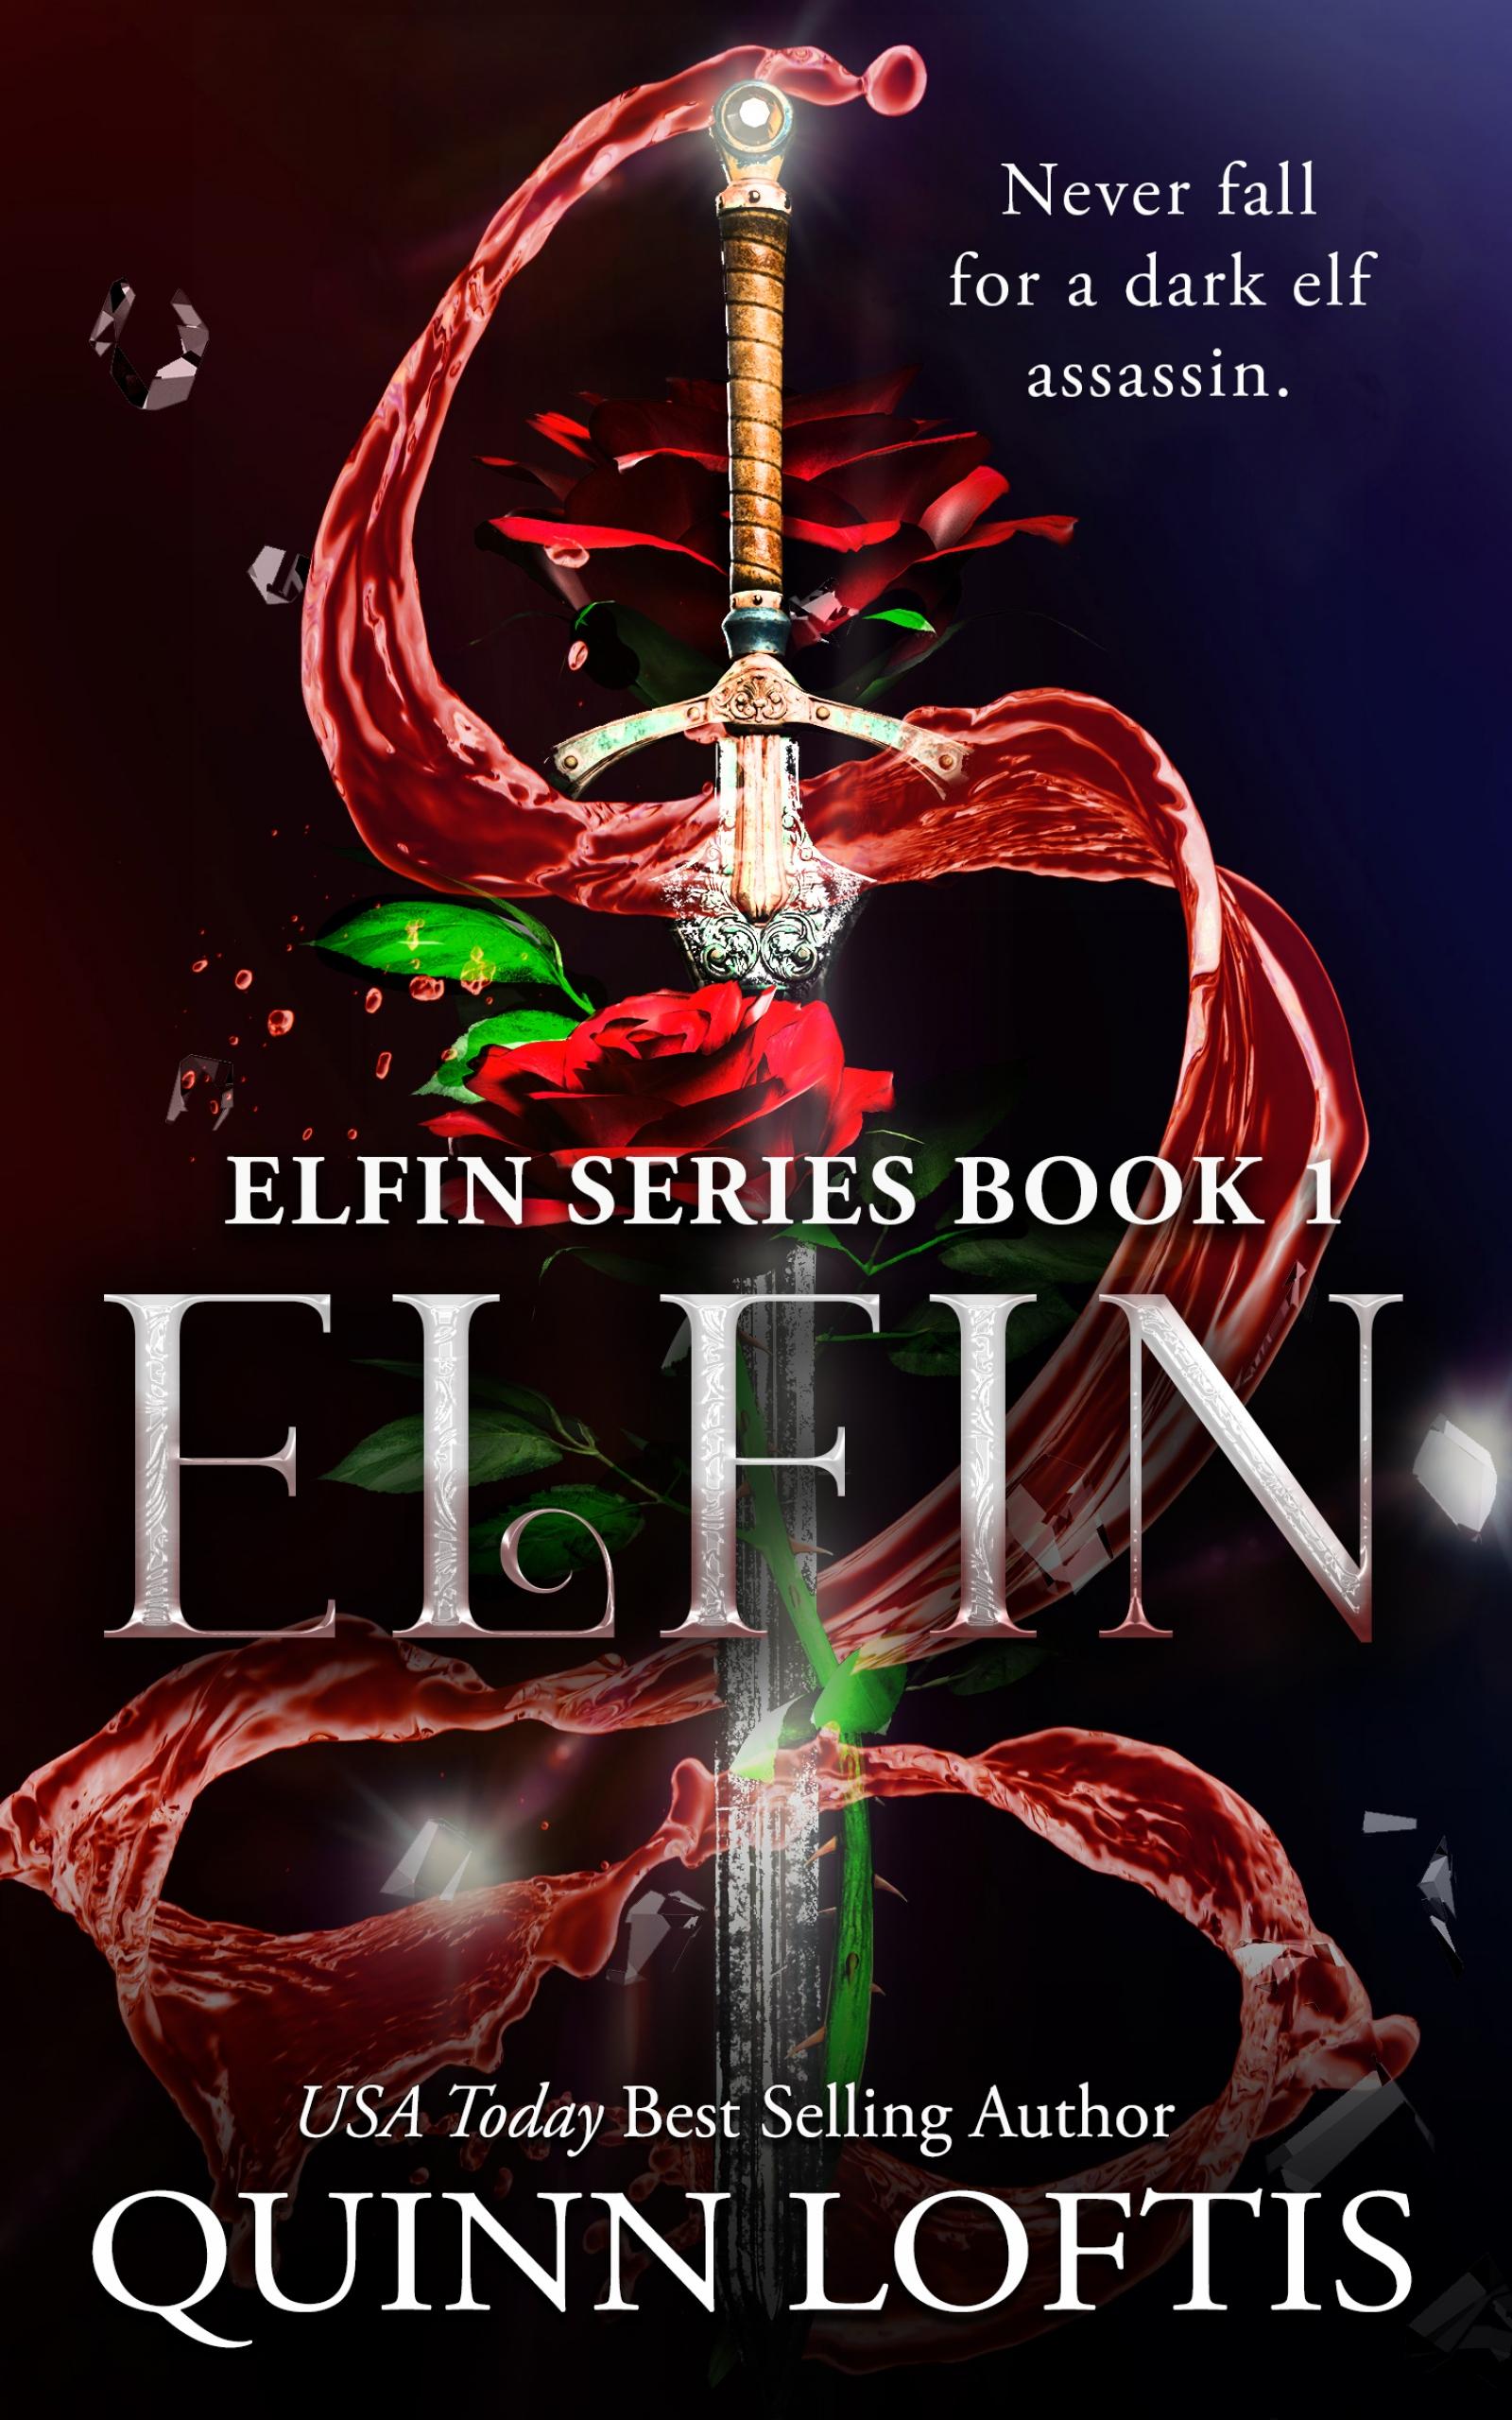 Cover Image of Elfin, Book 1 The Elfin Series